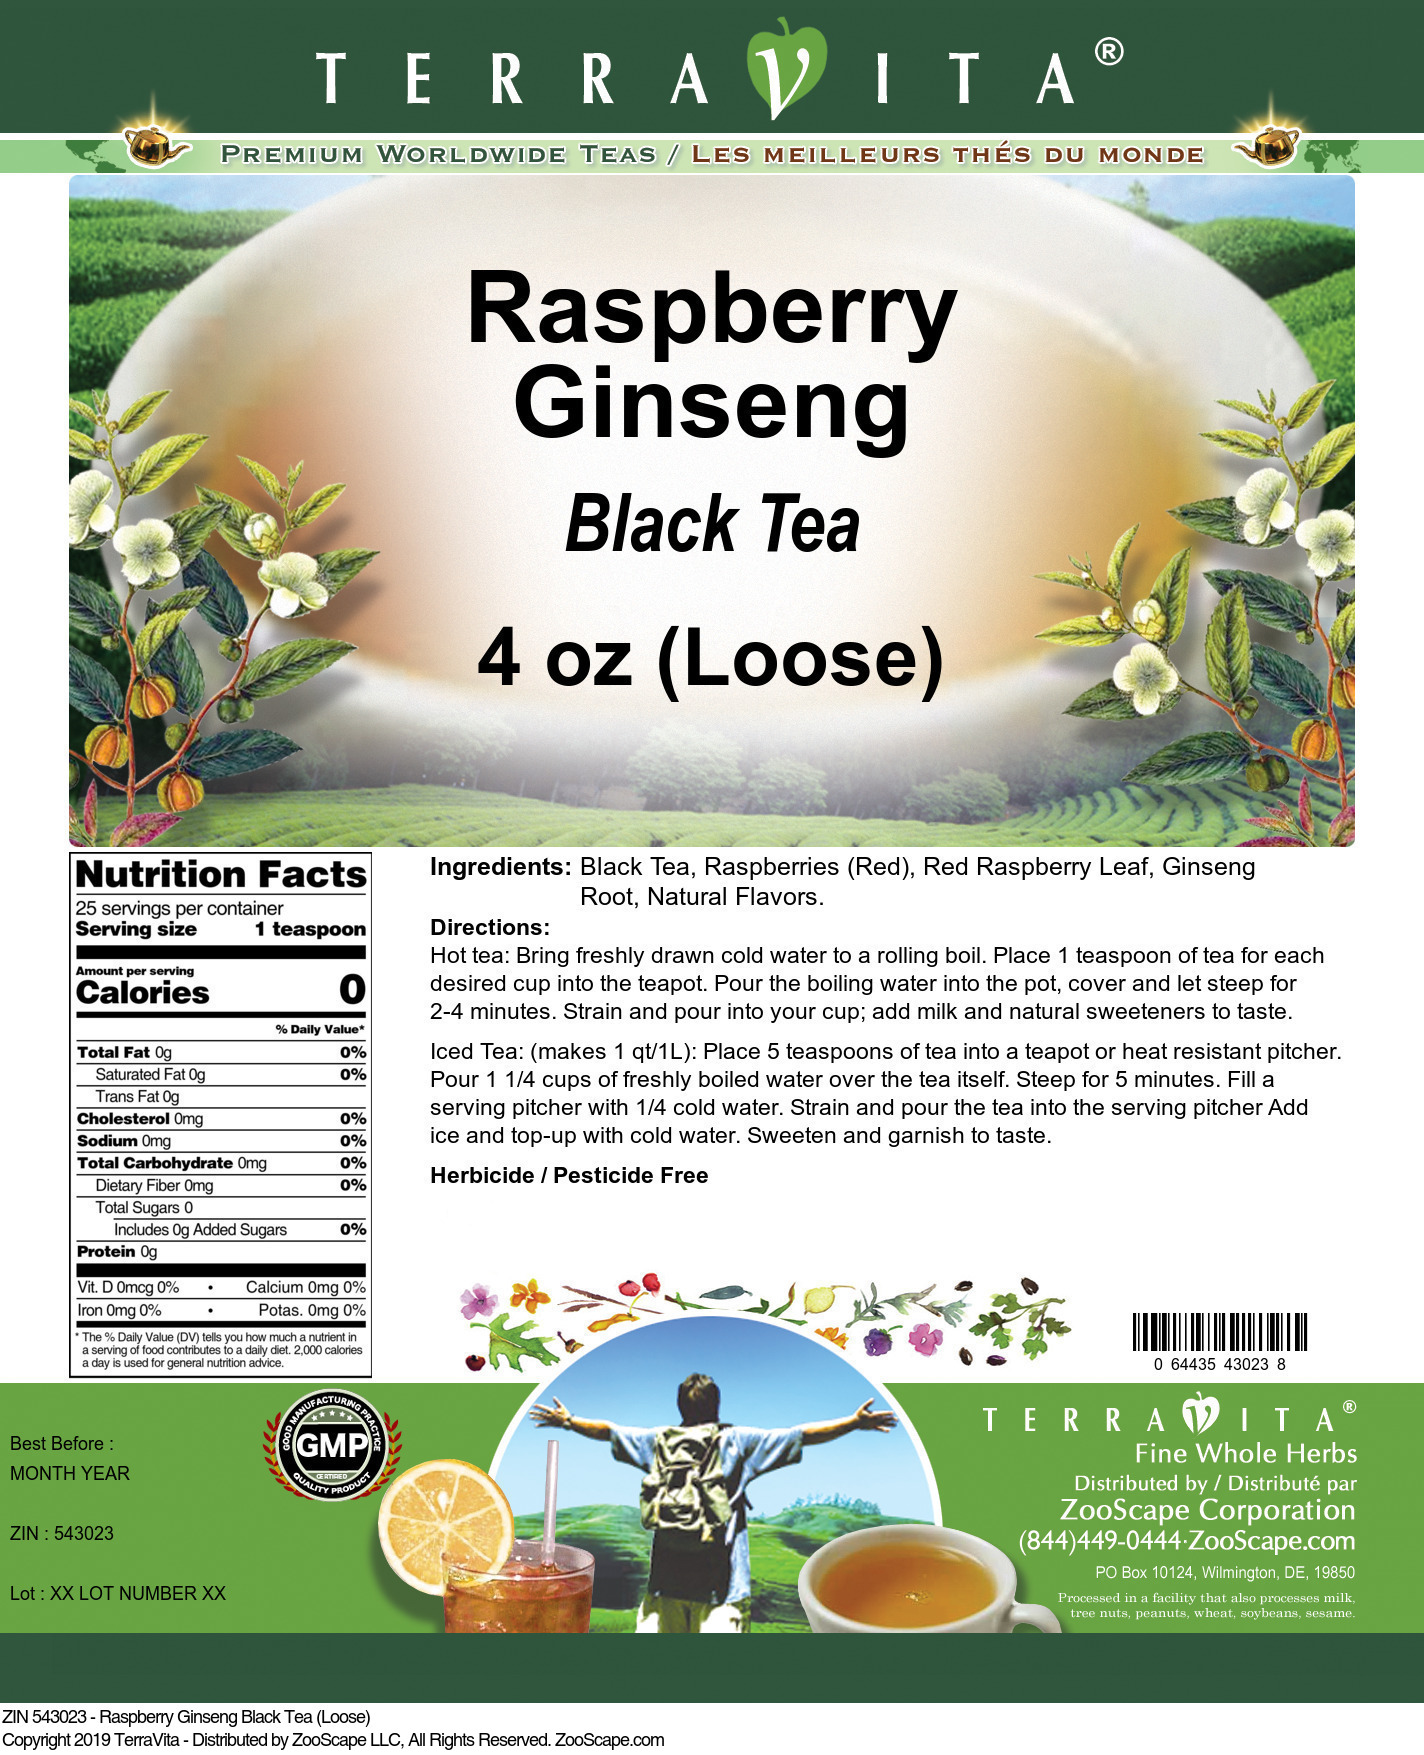 Raspberry Ginseng Black Tea (Loose)